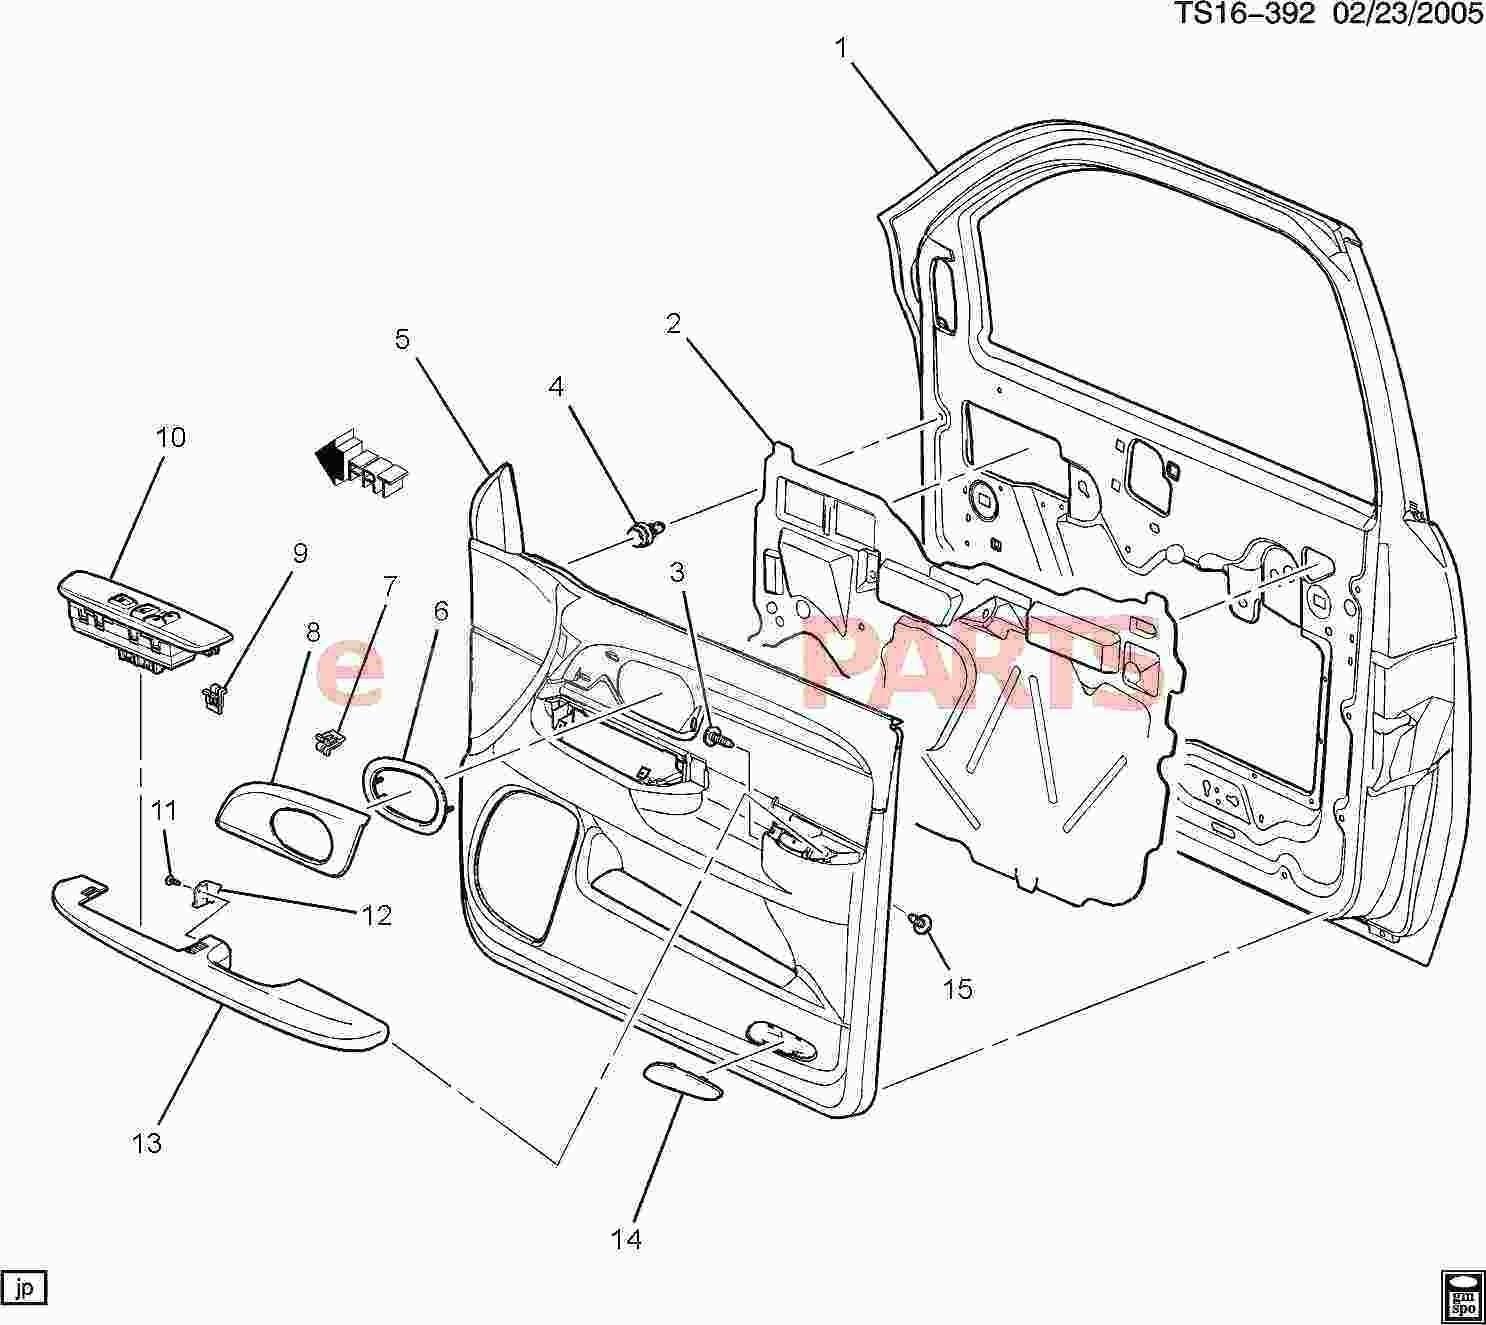 Car Body Parts Names Diagram Car Parts Labeled Diagram Of Car Body Parts Names Diagram